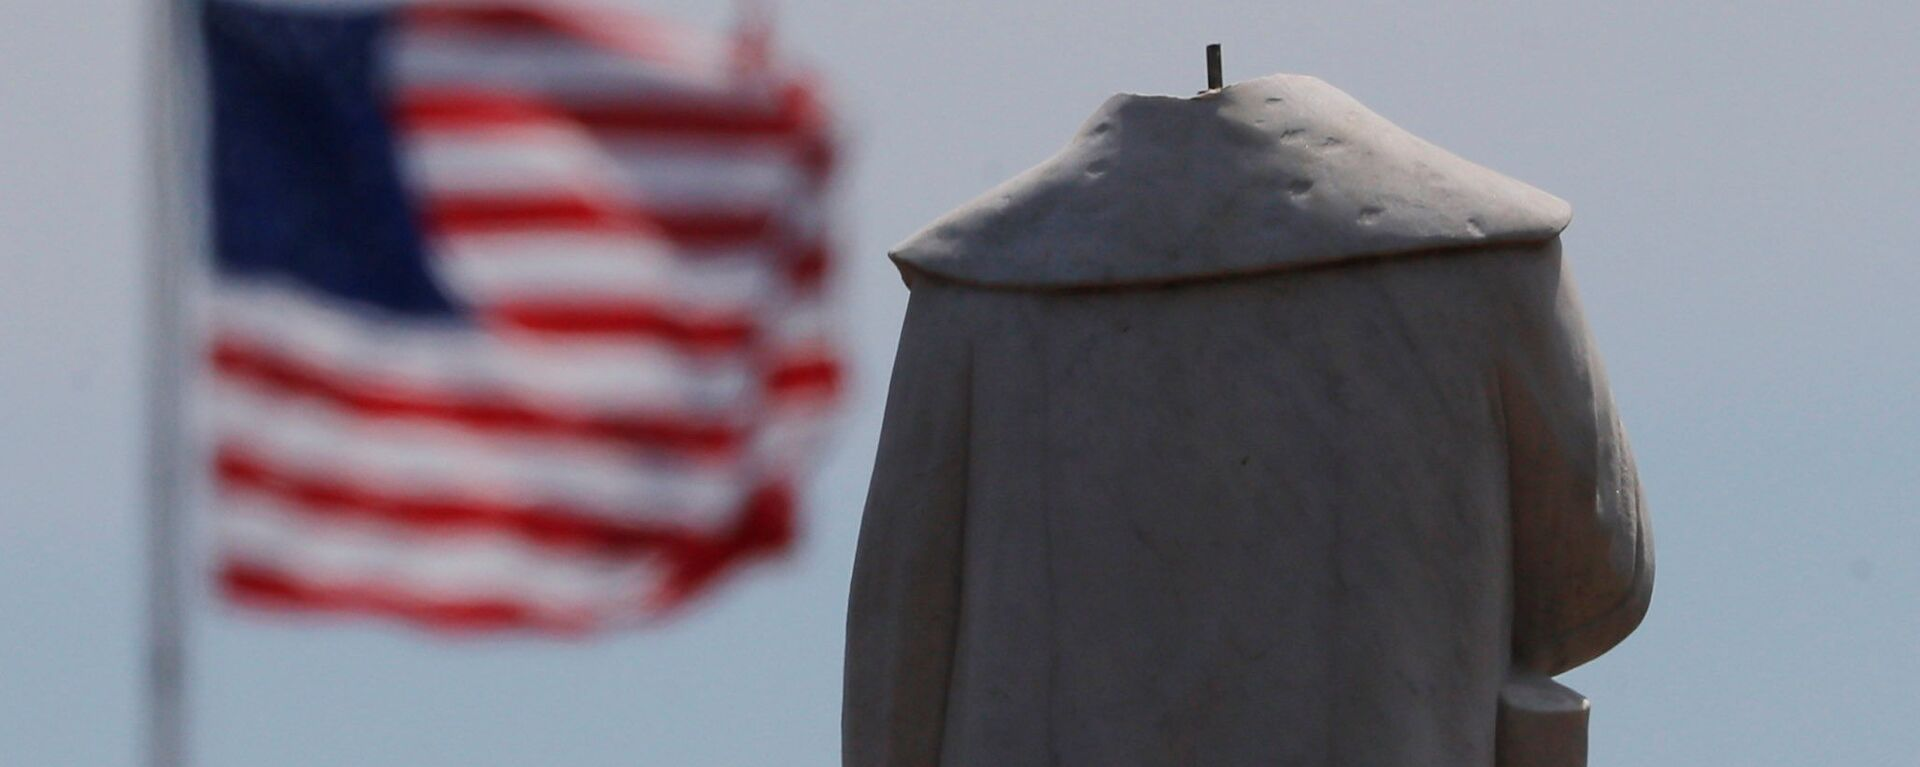 Протестующие обезглавили монумент первооткрывателя Америки Христофора Колумба в Бостоне - Sputnik Латвия, 1920, 14.06.2020